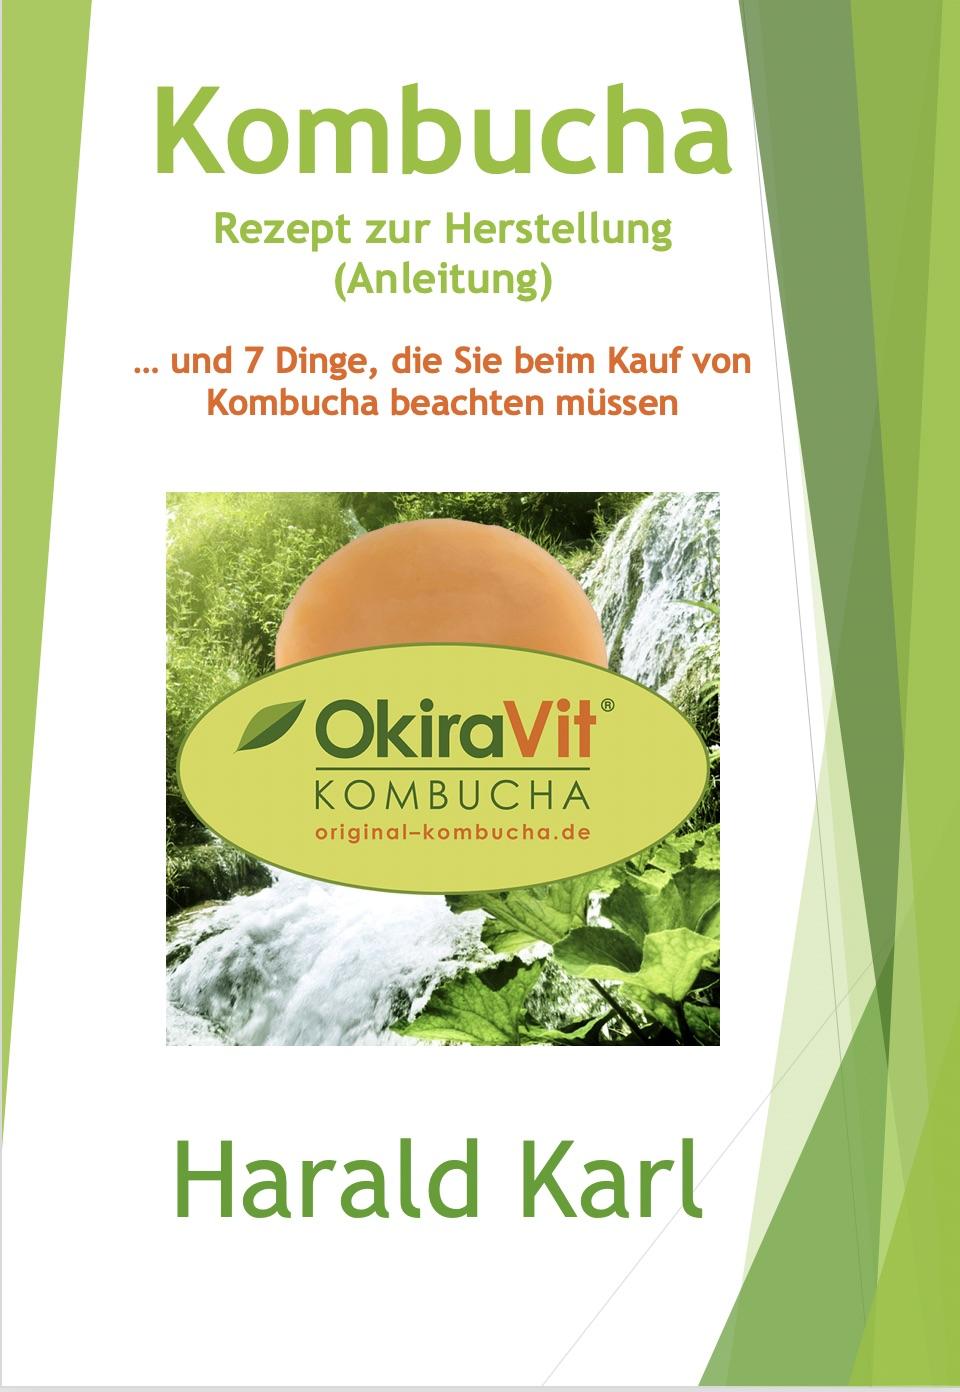 Kombucha-Anleitung-o-final